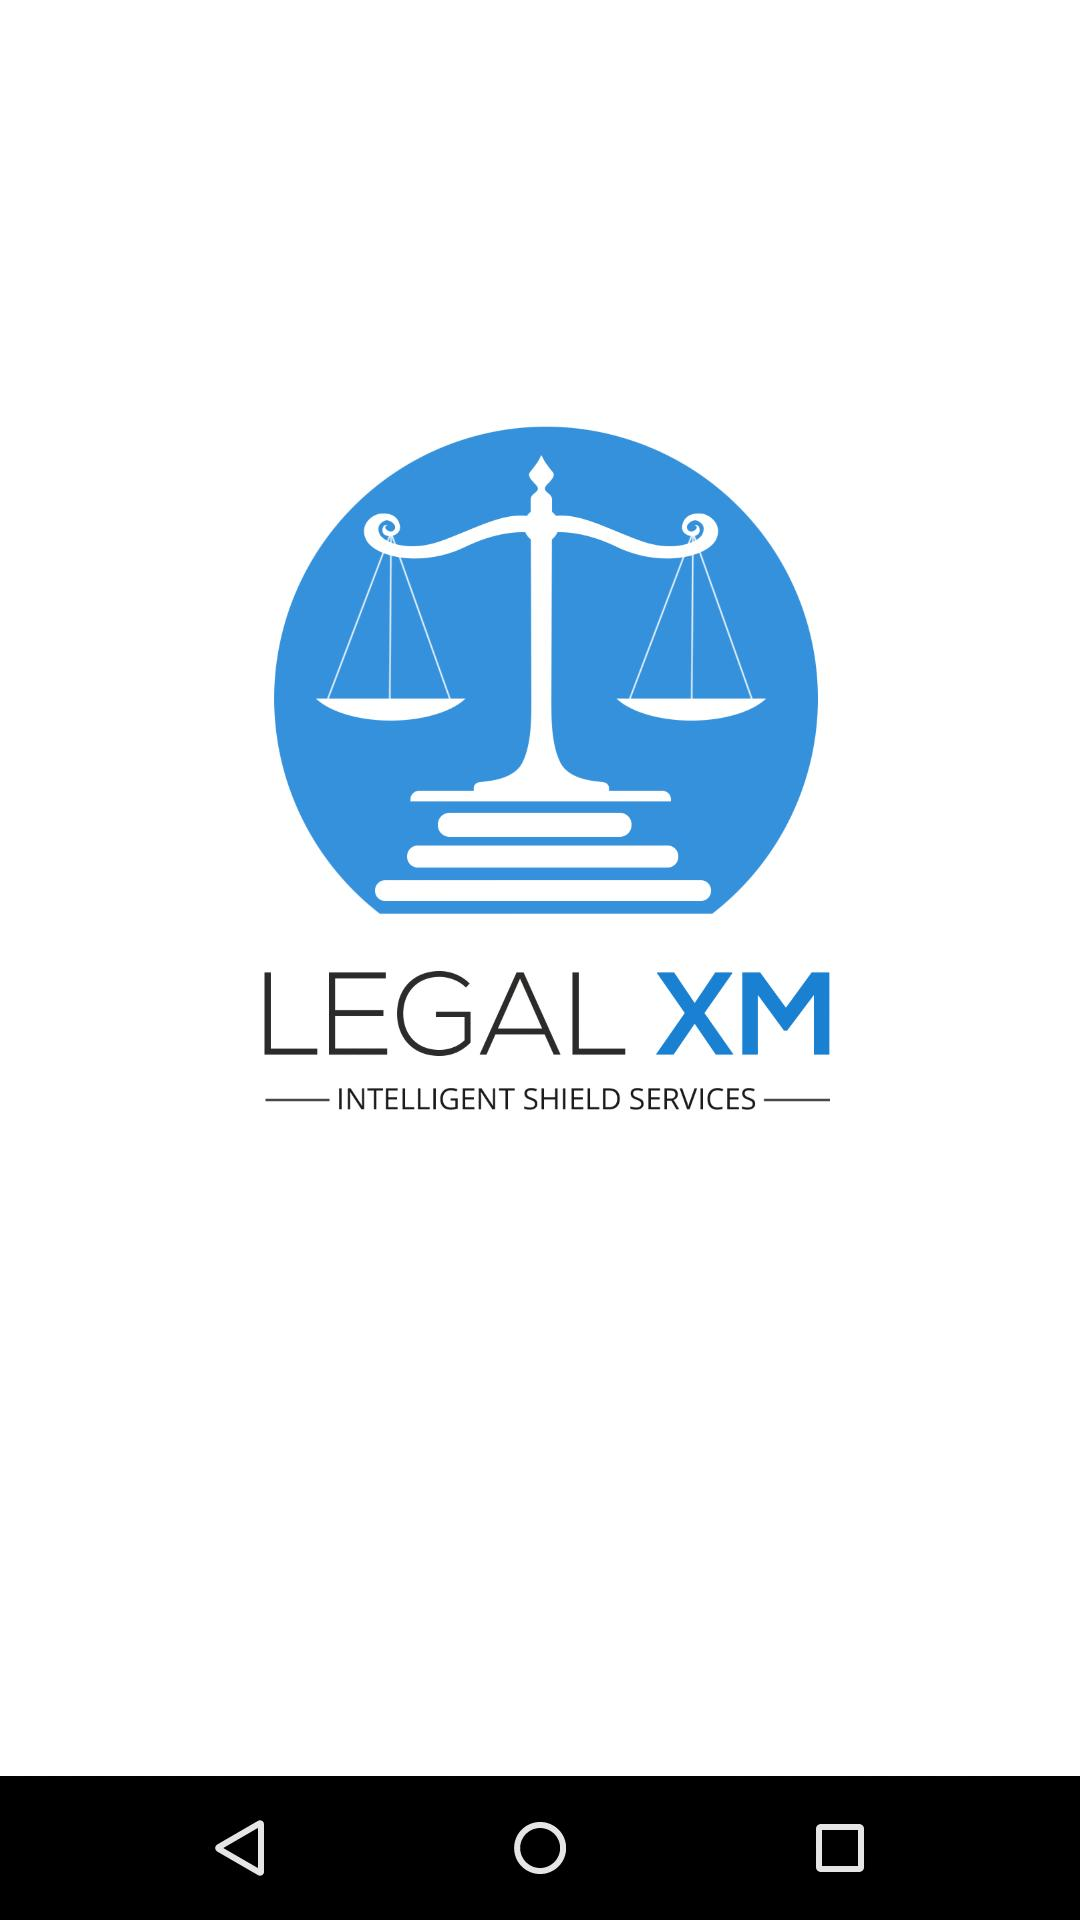 Legal XM poster